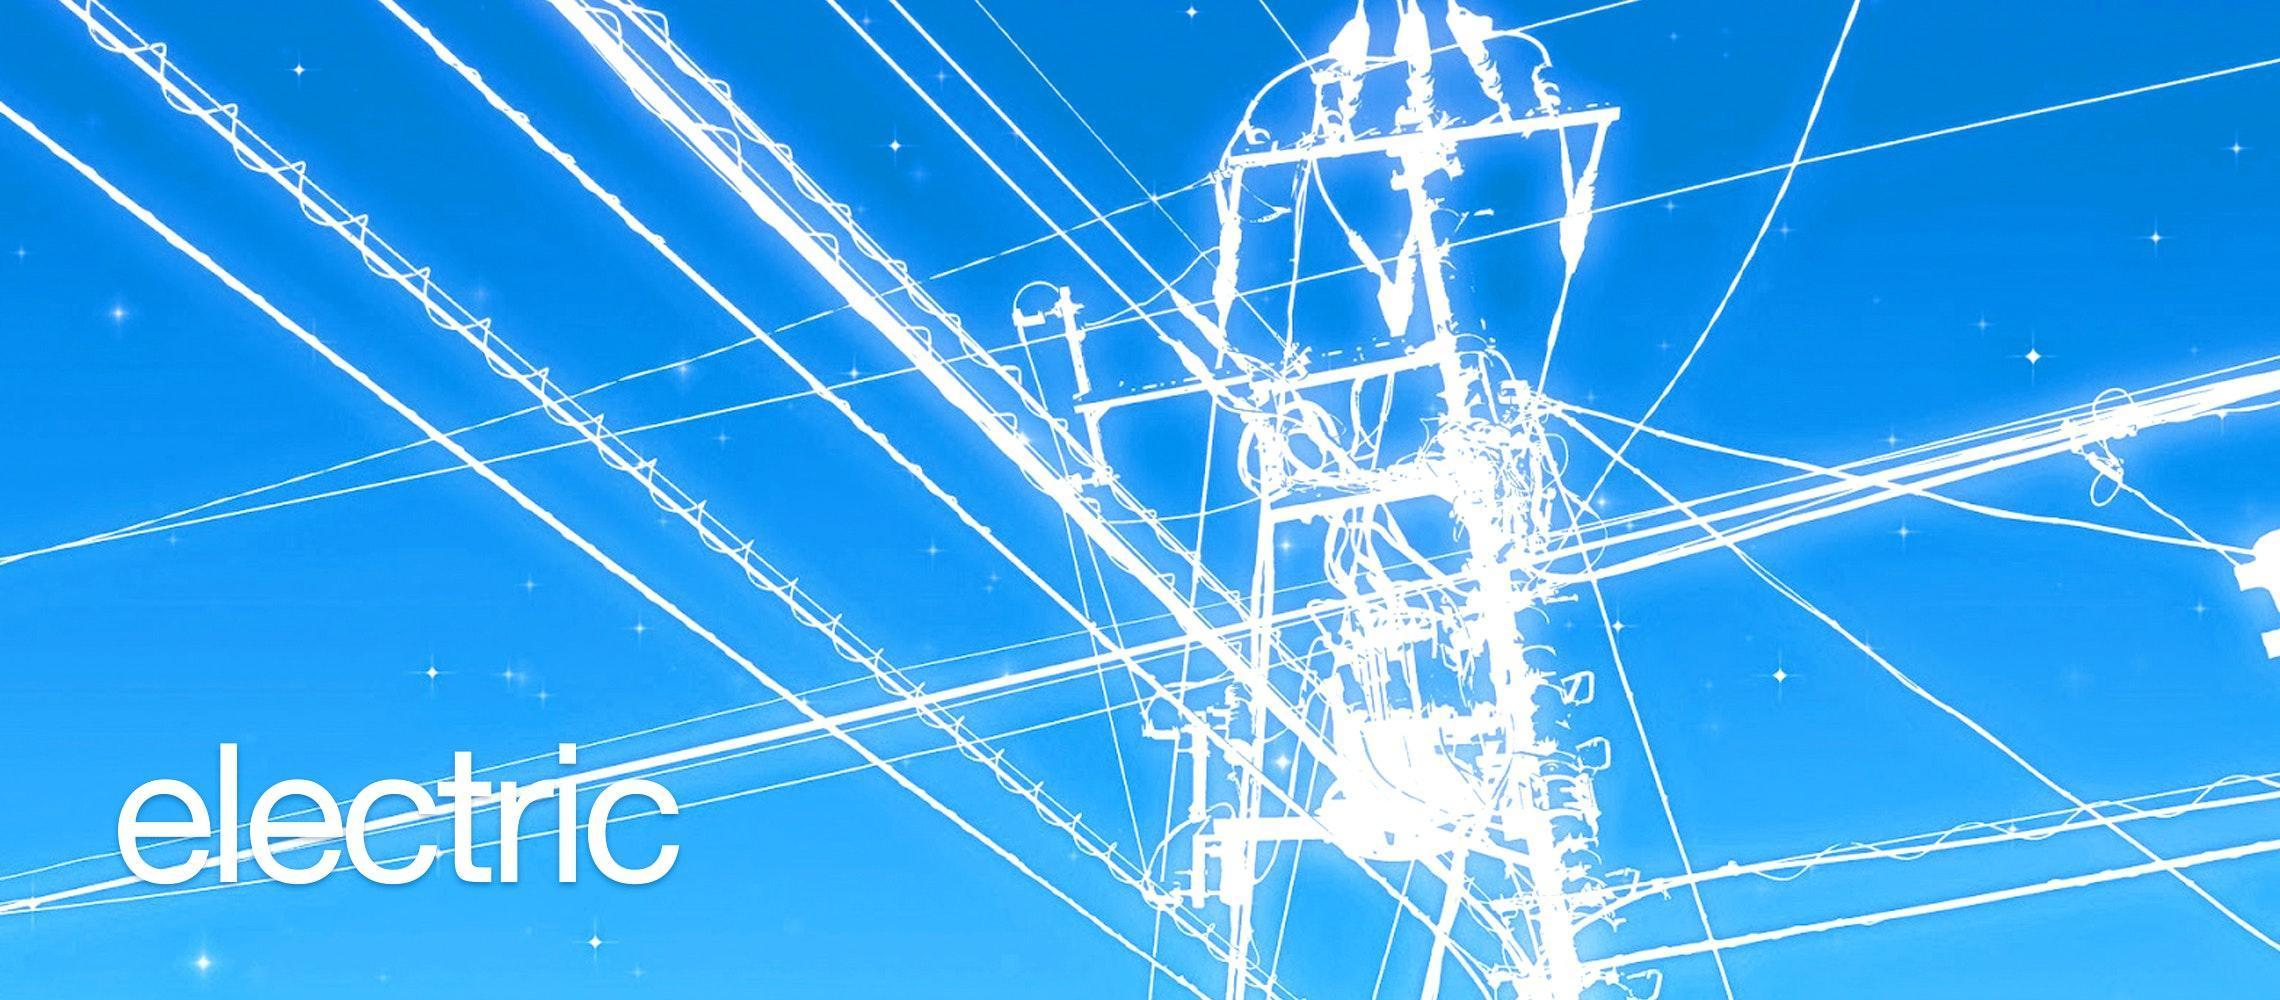 Electrical Engineering Wallpapers Top Free Electrical Engineering